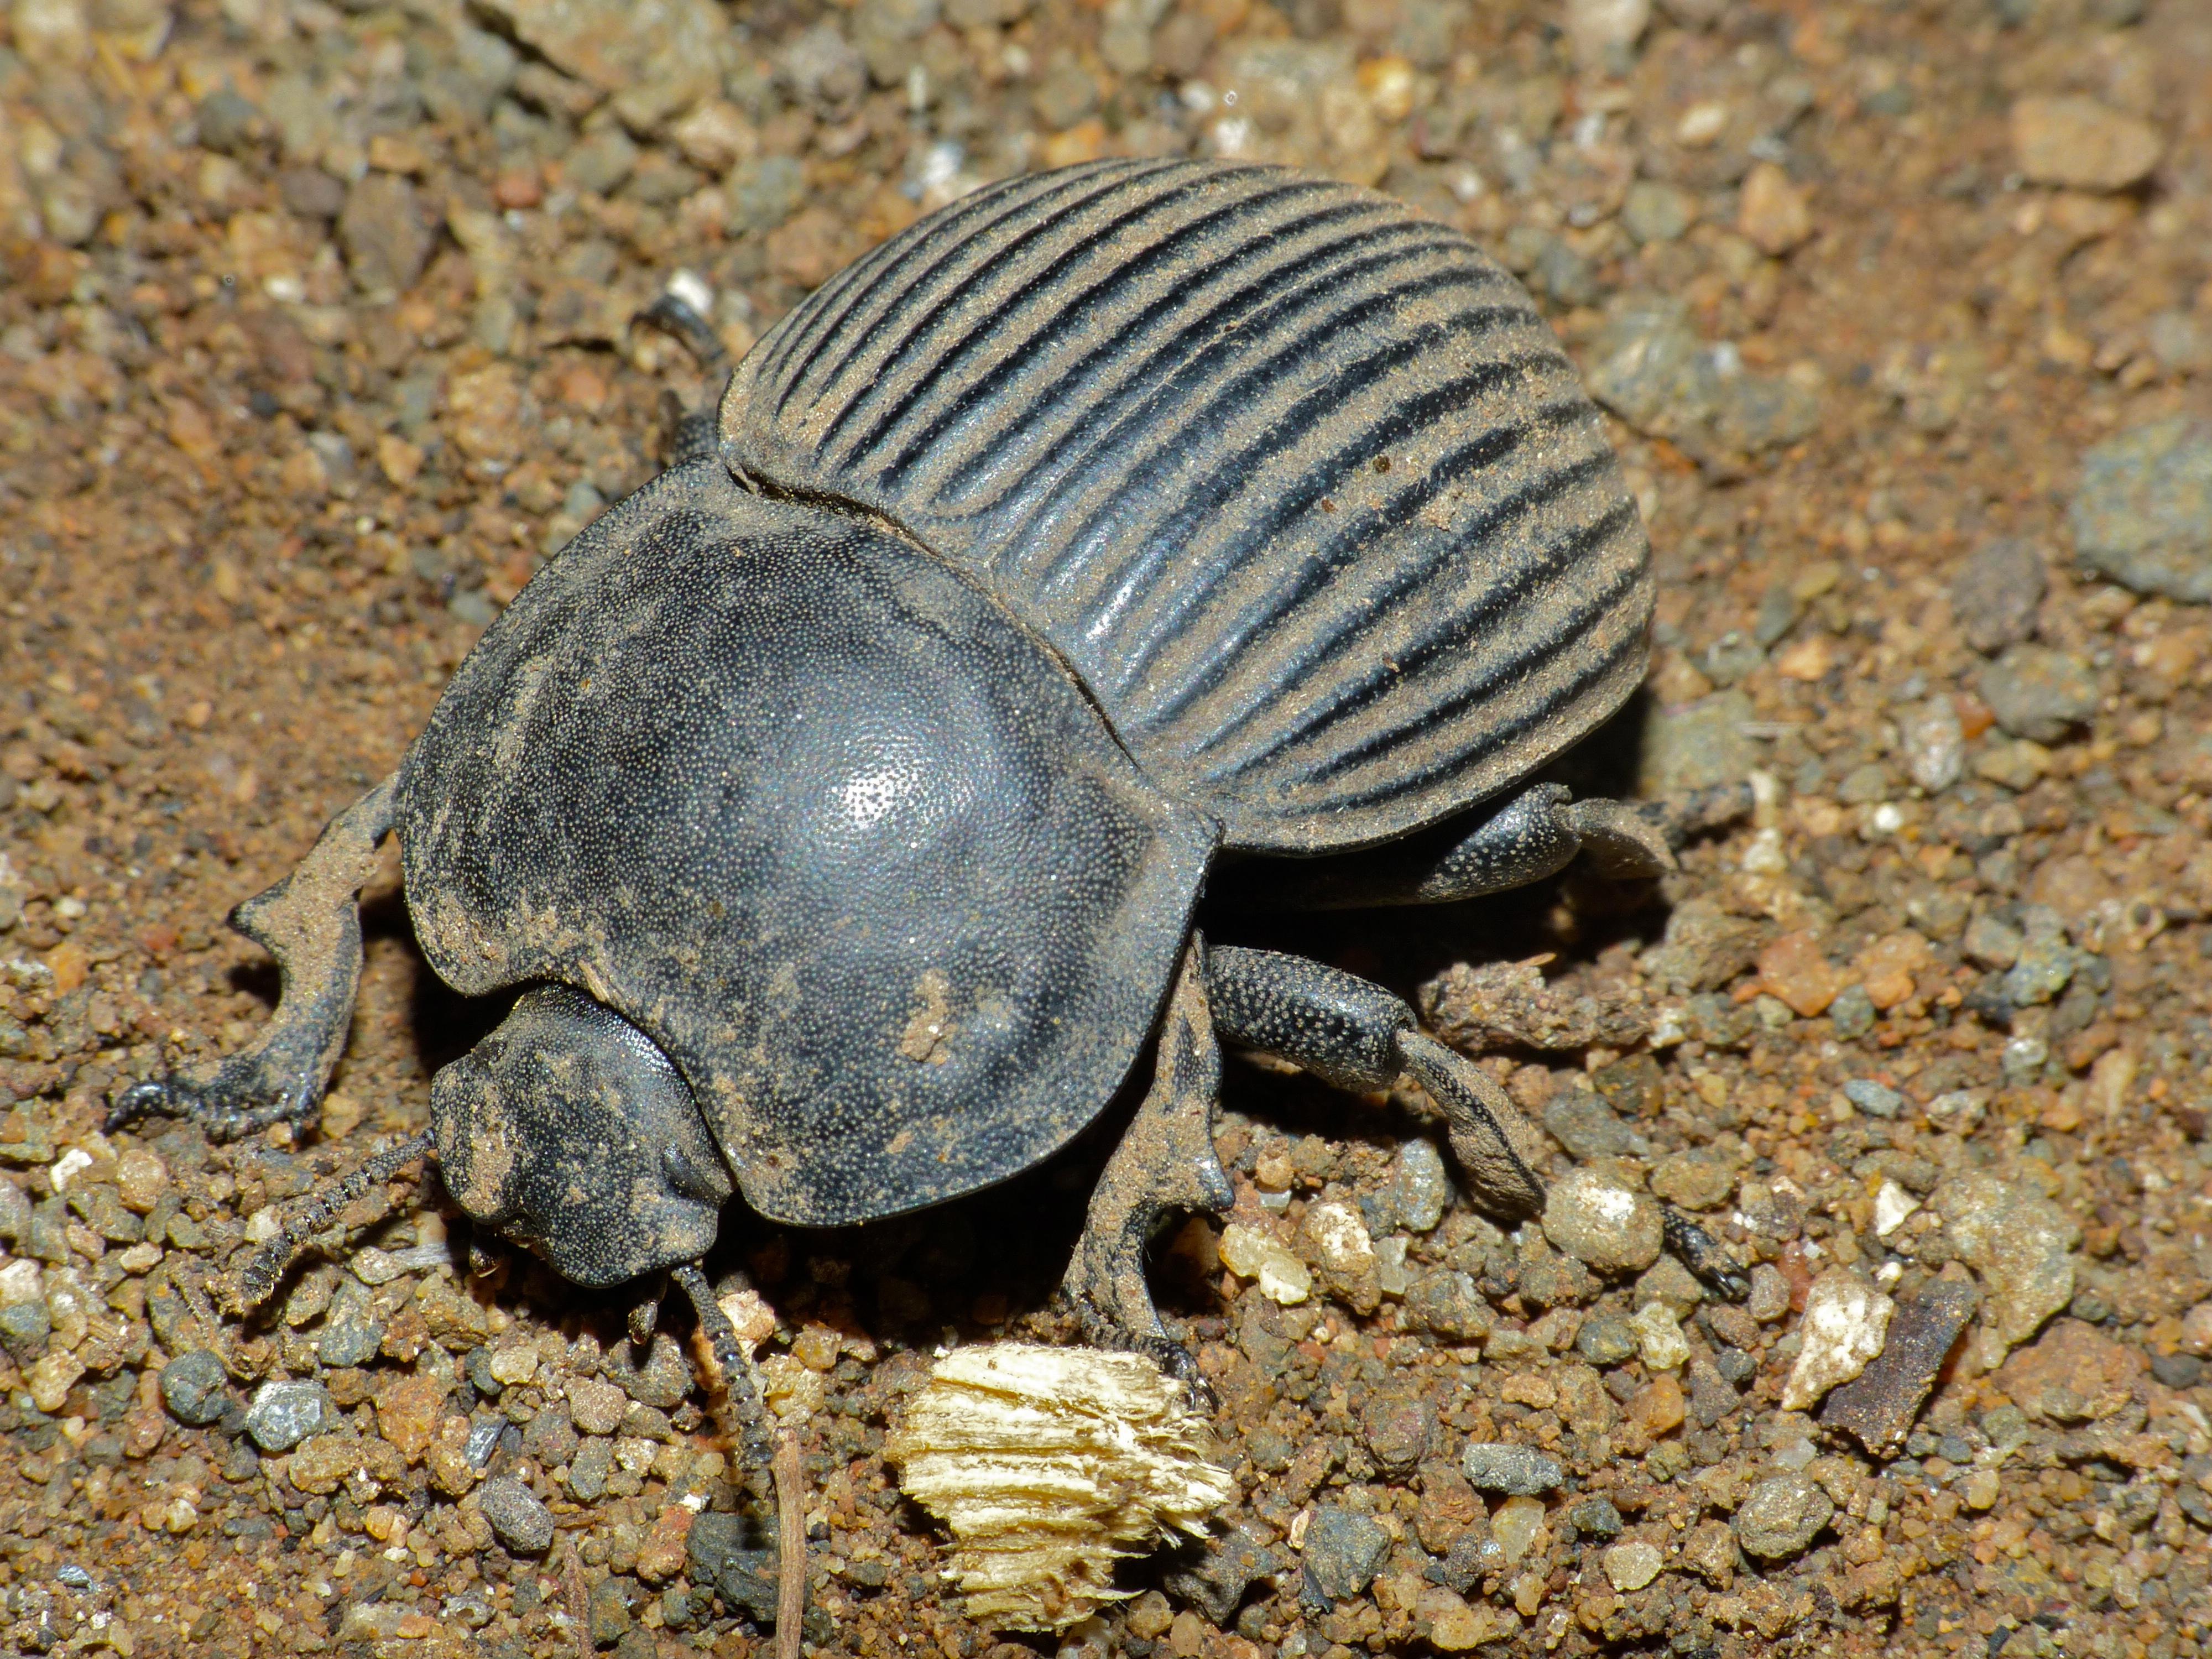 Filelarge armoured darkling beetle anomalipus elephas filelarge armoured darkling beetle anomalipus elephas 11688674945g sciox Images